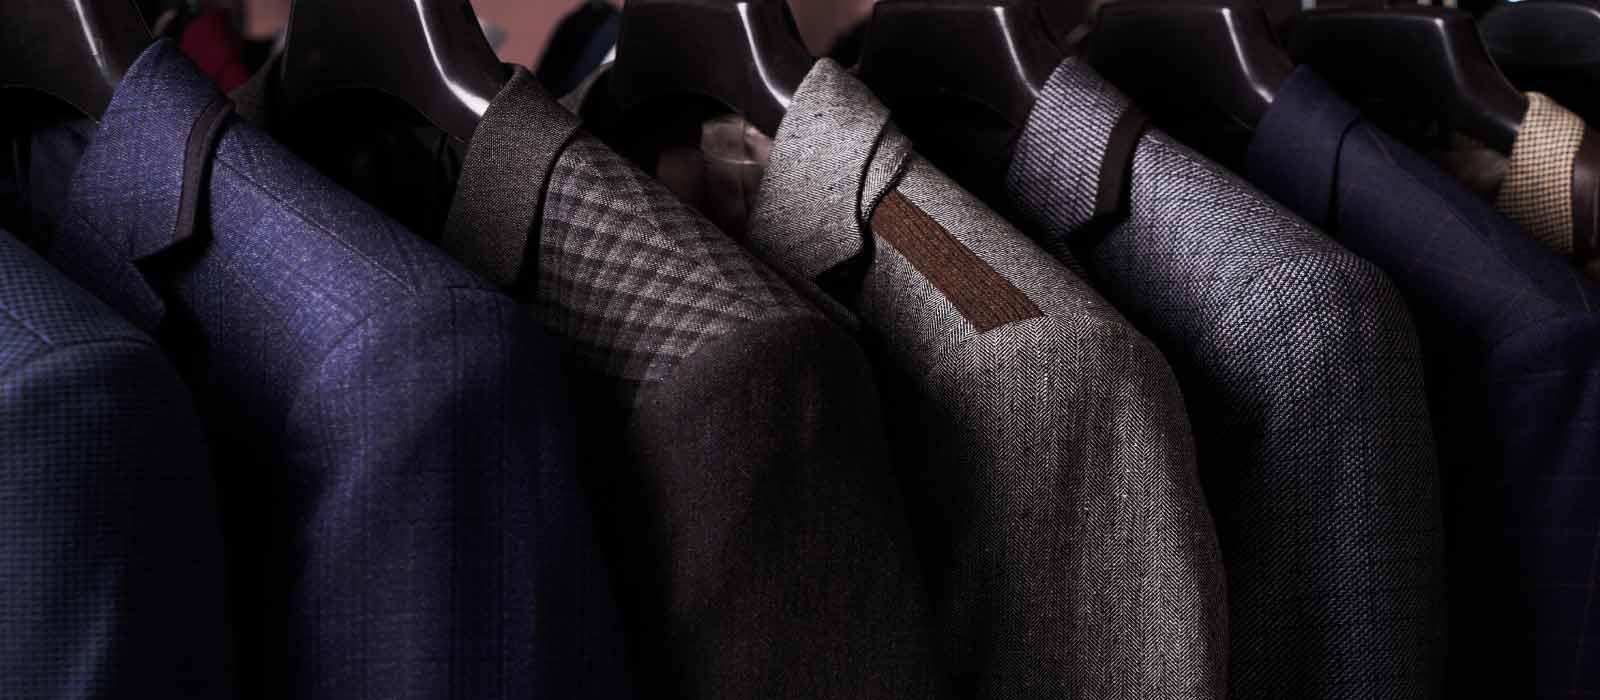 finest-tailoring-in-las-vegas